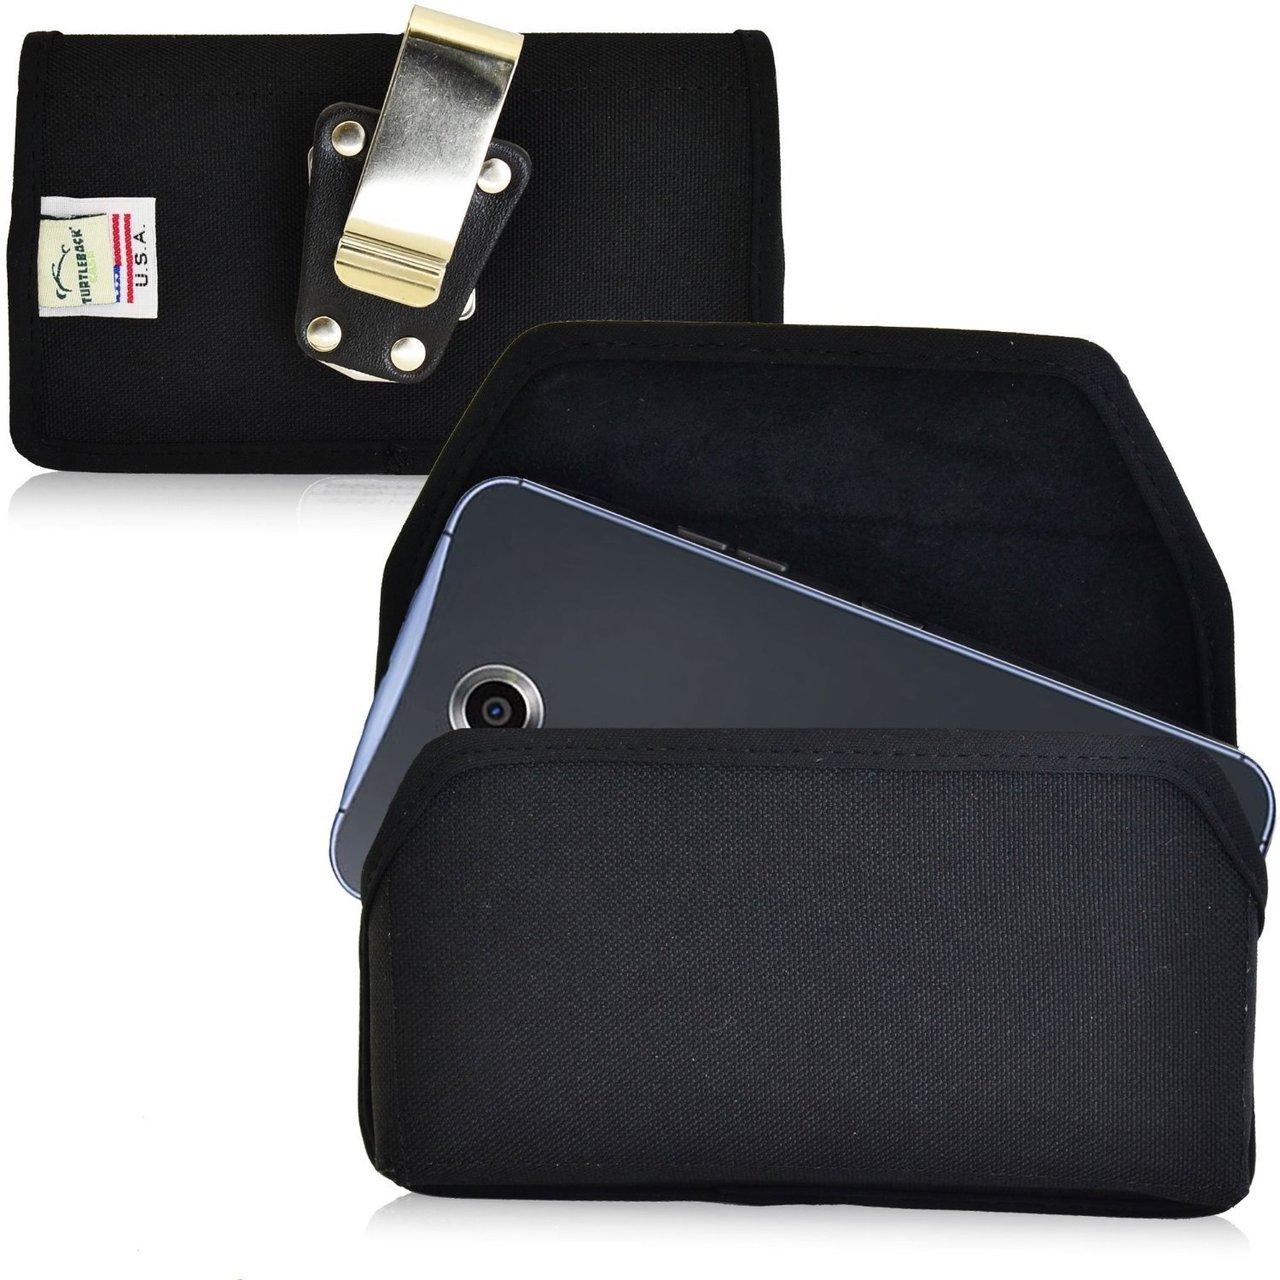 detailed look 6ae87 b3106 Google Nexus 6 Horizontal Nylon Holster, Metal Belt Clip